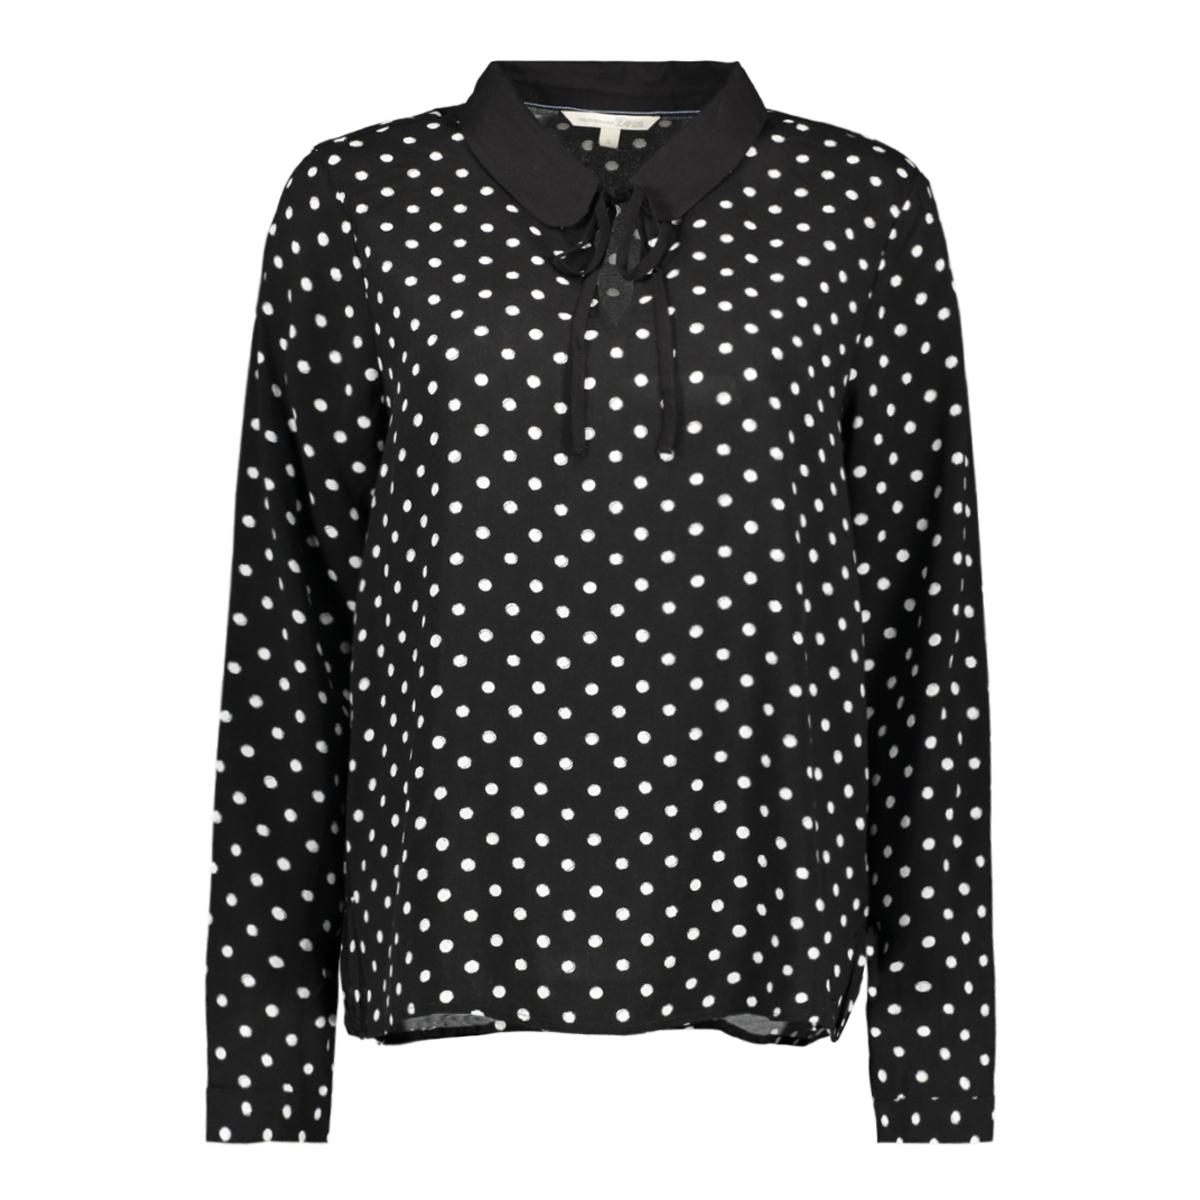 1007564xx71 tom tailor blouse 15306